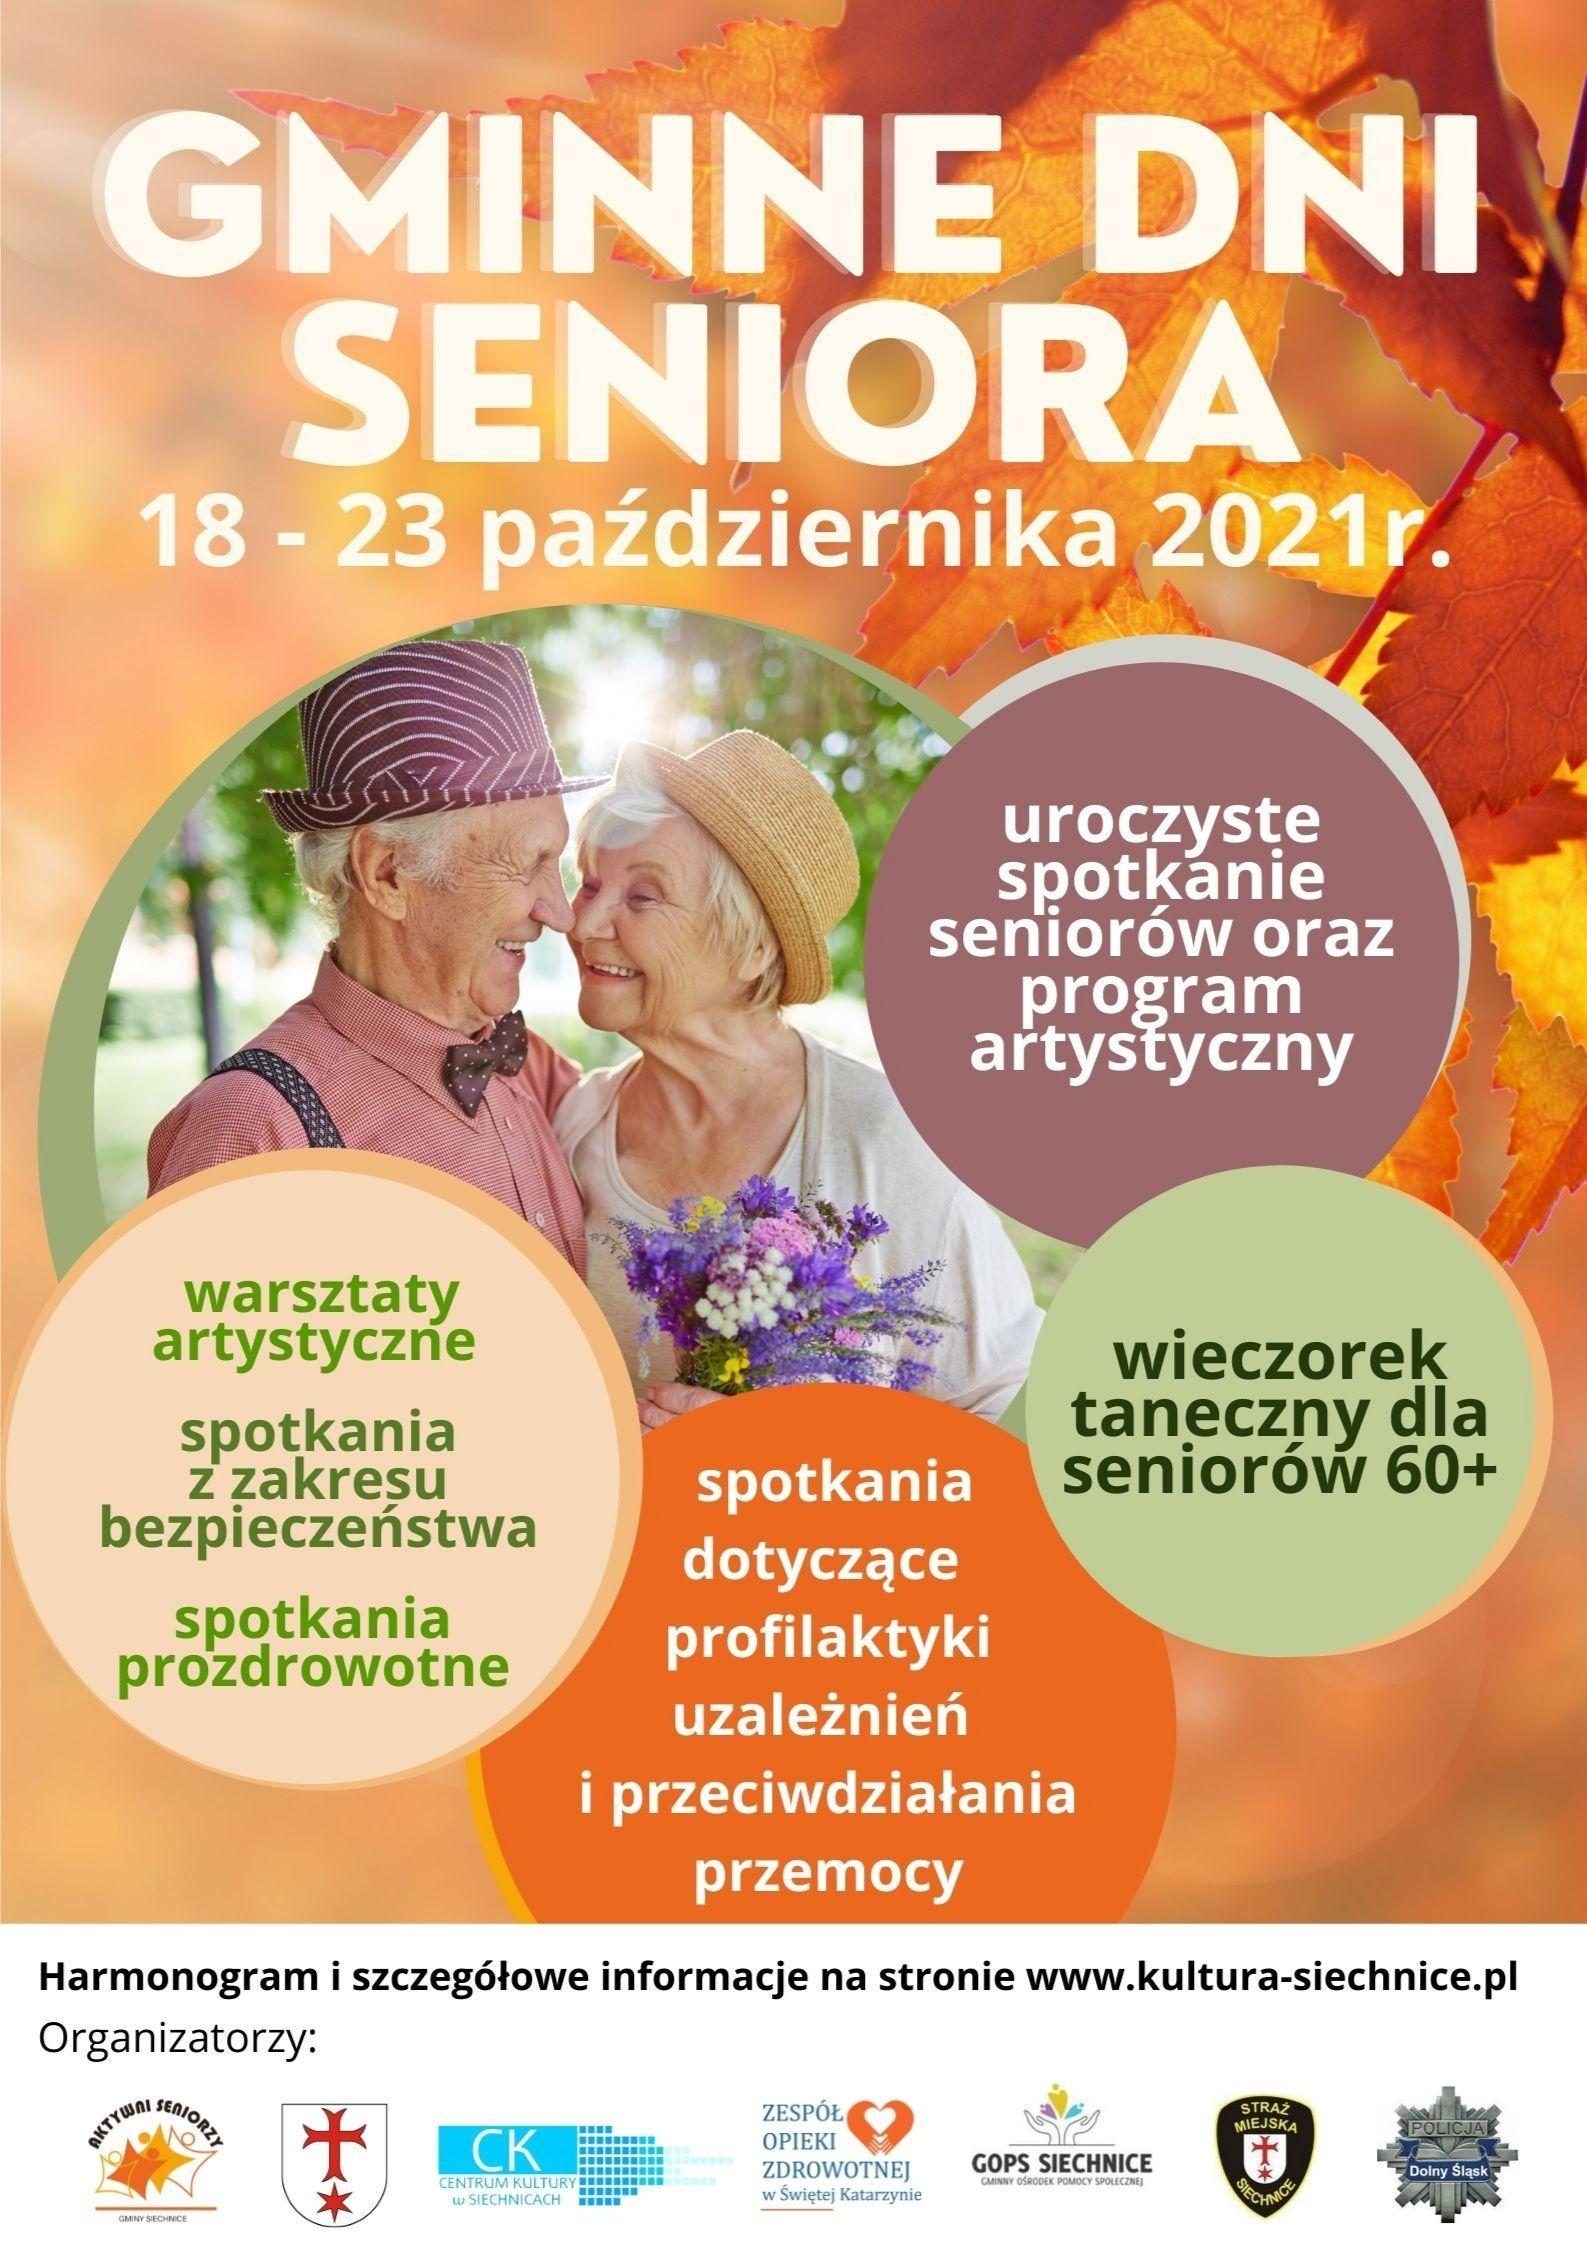 Plakat na Gminne Dni Seniora 18 - 23 października